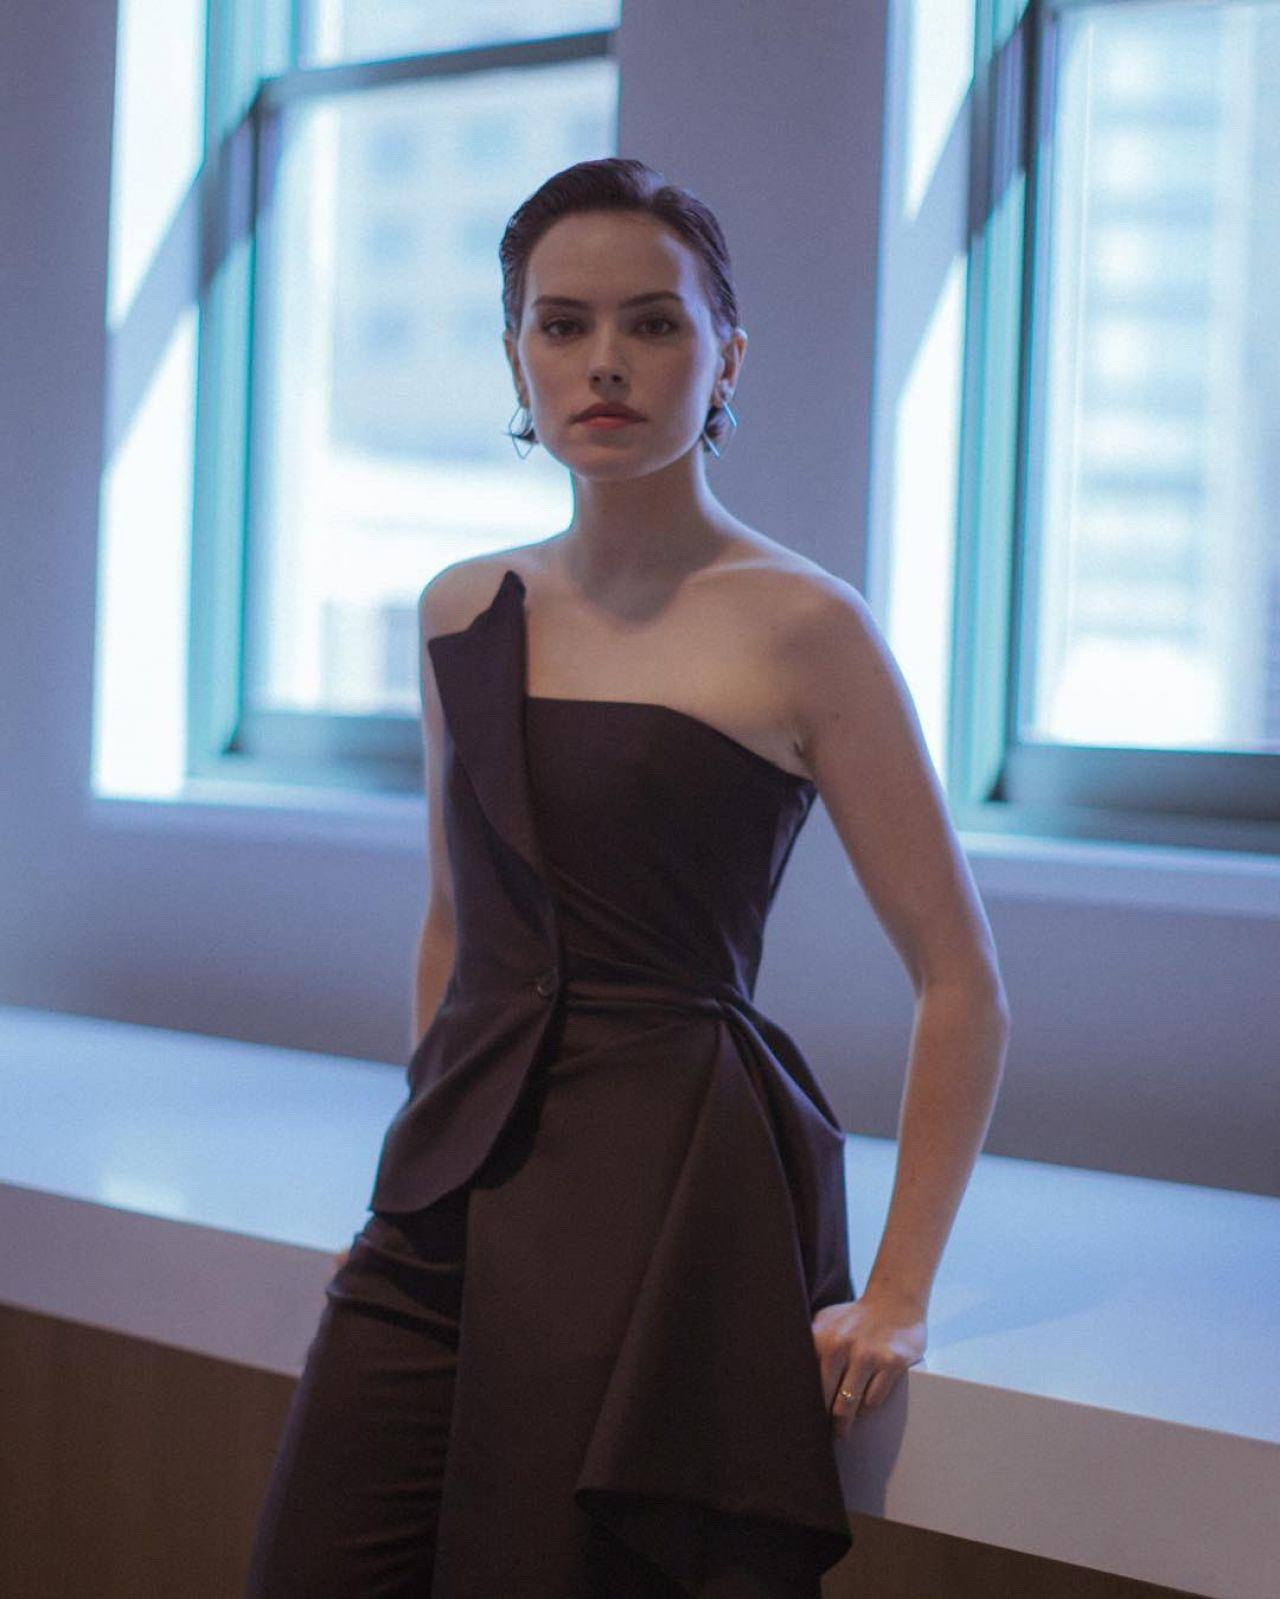 2019 Daisy Ridley nudes (56 photo), Pussy, Sideboobs, Boobs, underwear 2017